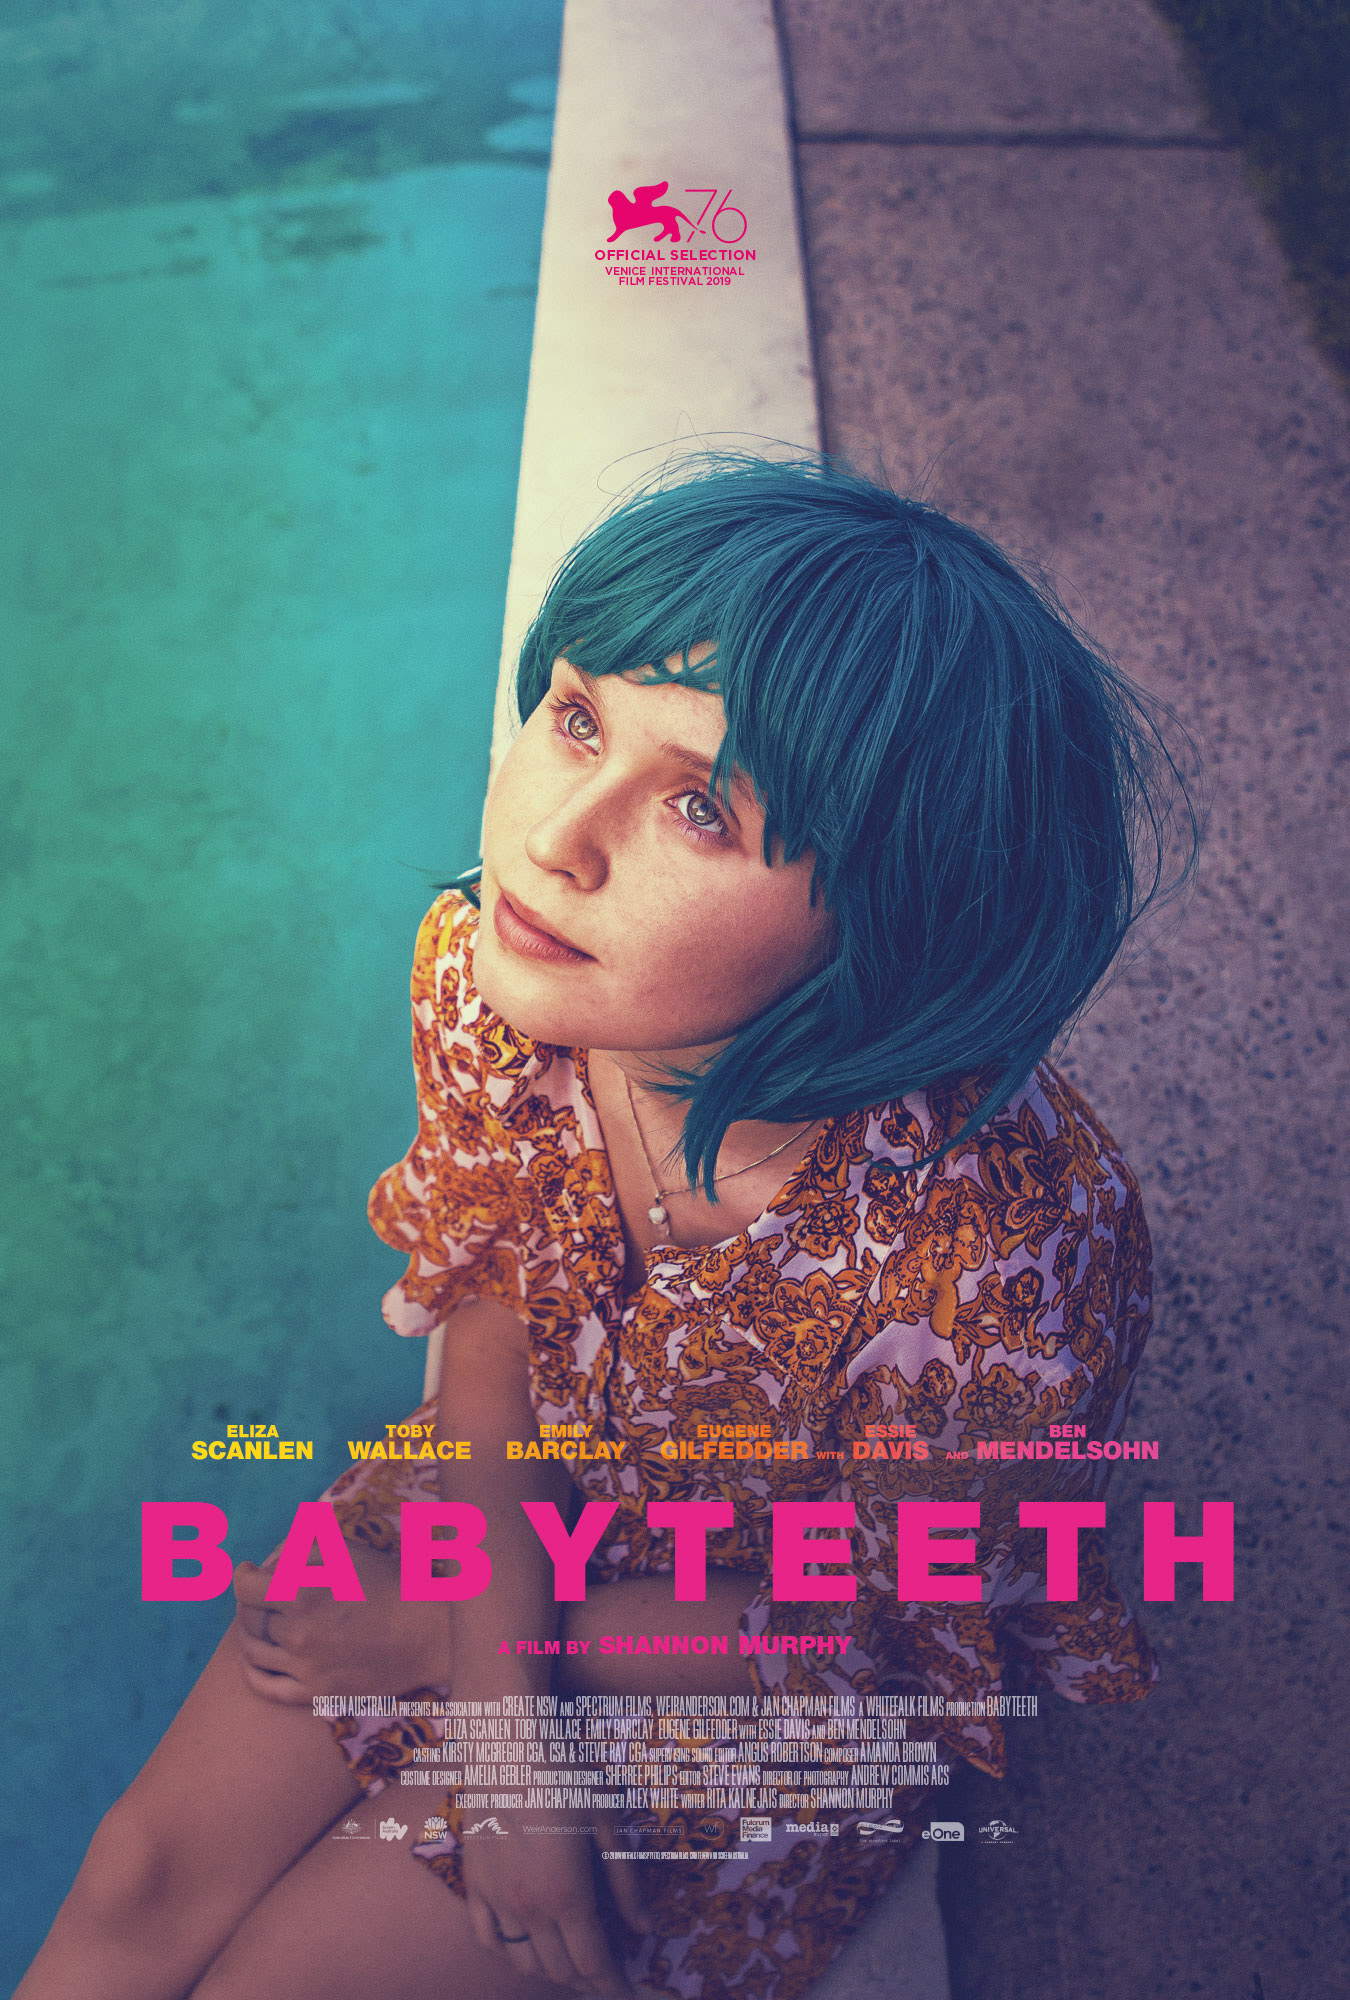 Babyteeth 1 Sheet Poster on Behance